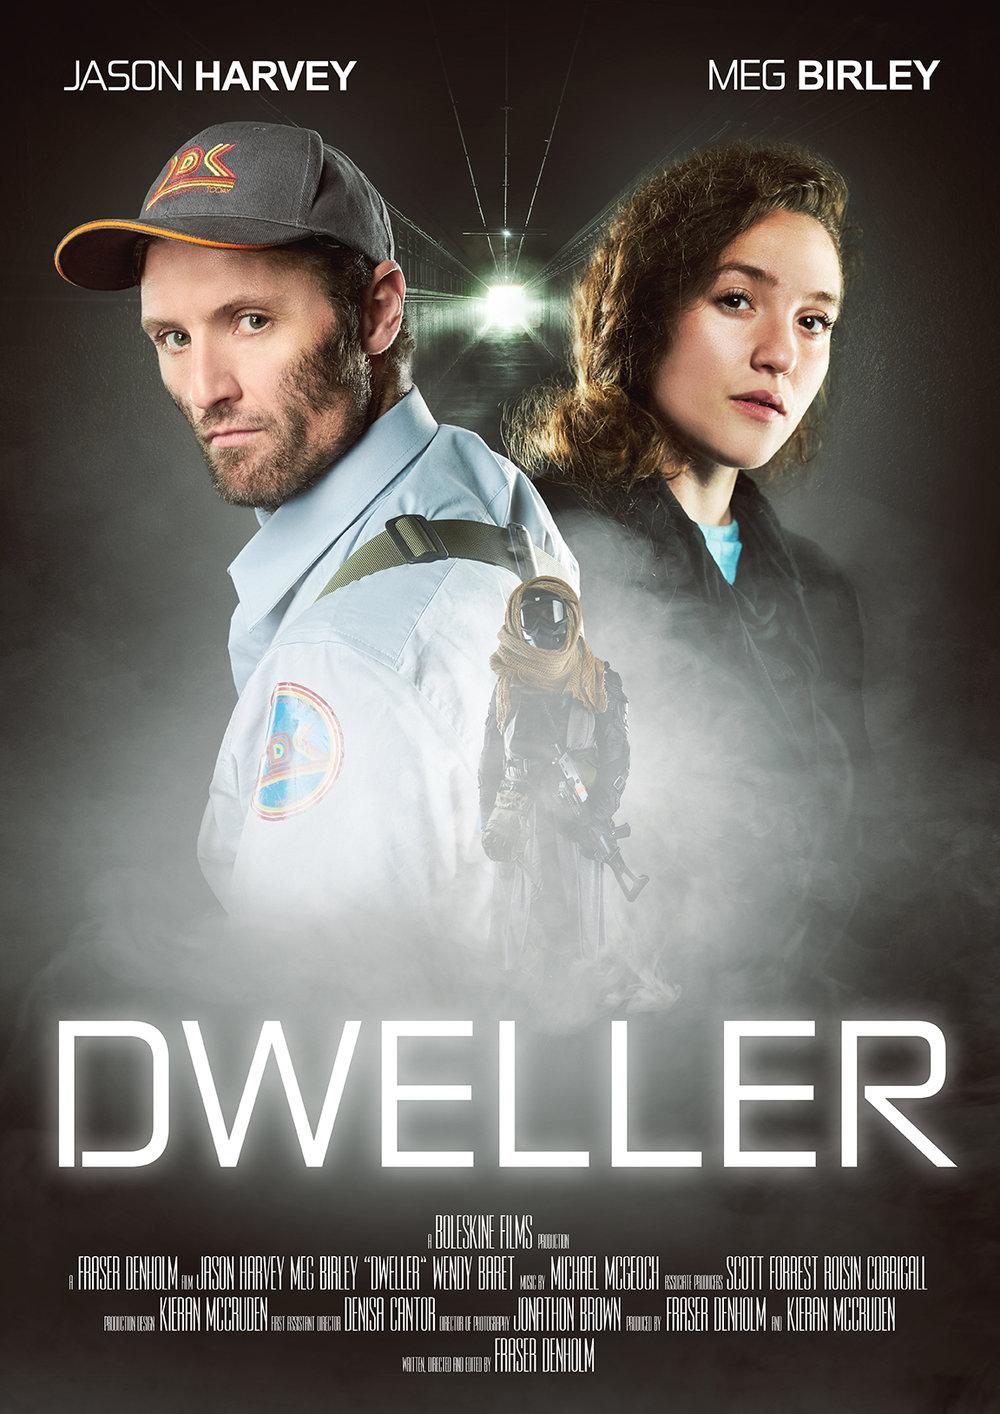 poster dweller 3a web.jpg